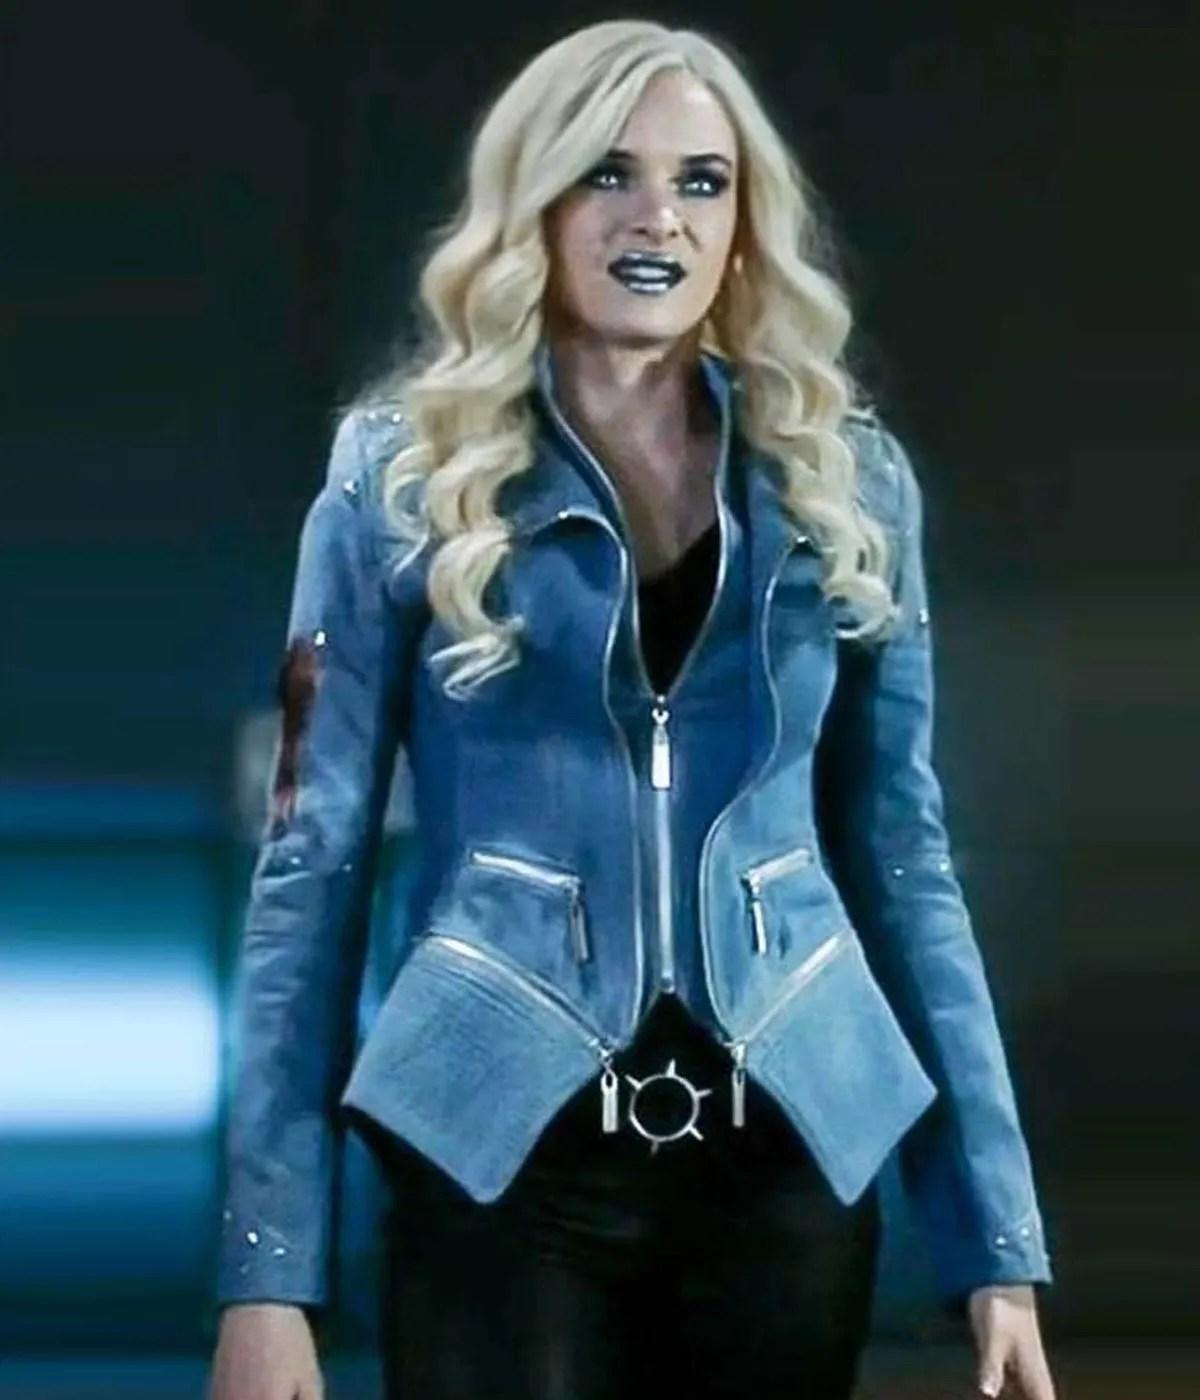 the-flash-killer-frost-jacket